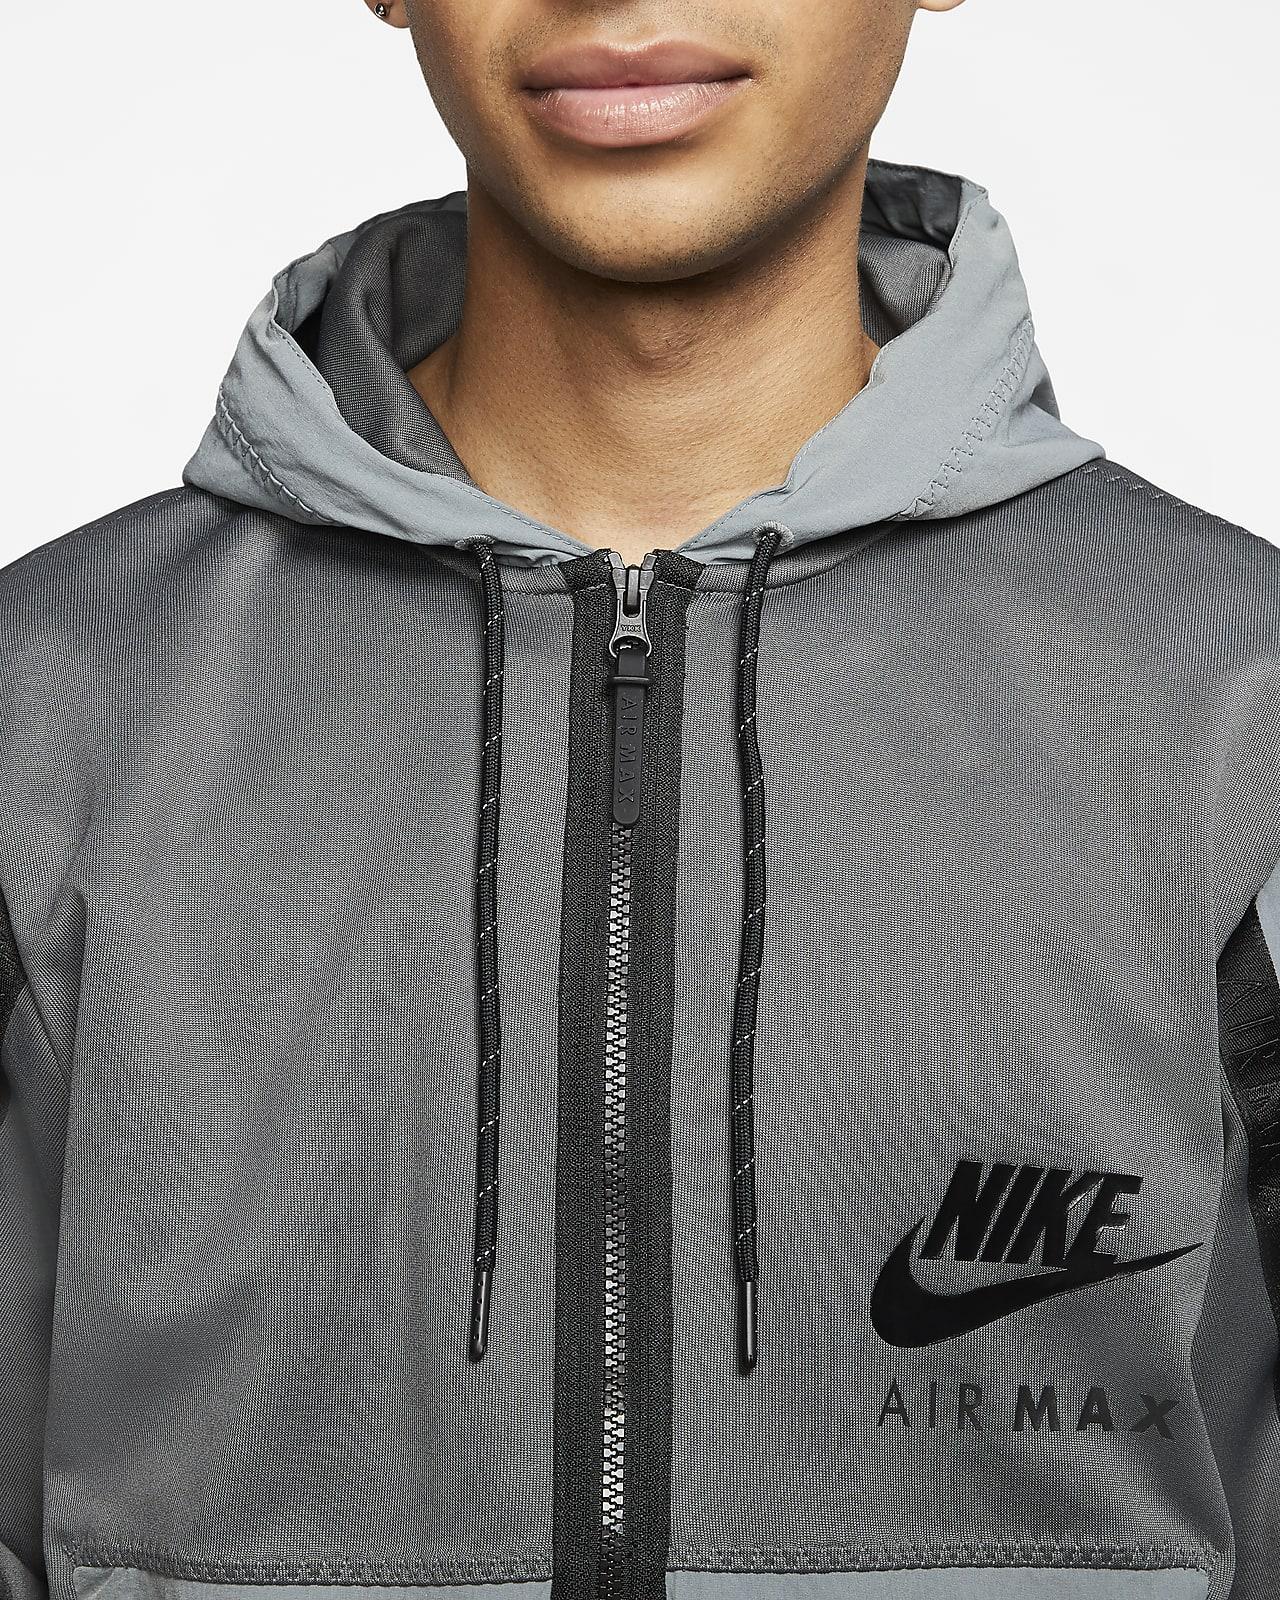 Sweat à capuche à zip intégral Nike Sportswear Air Max pour Homme